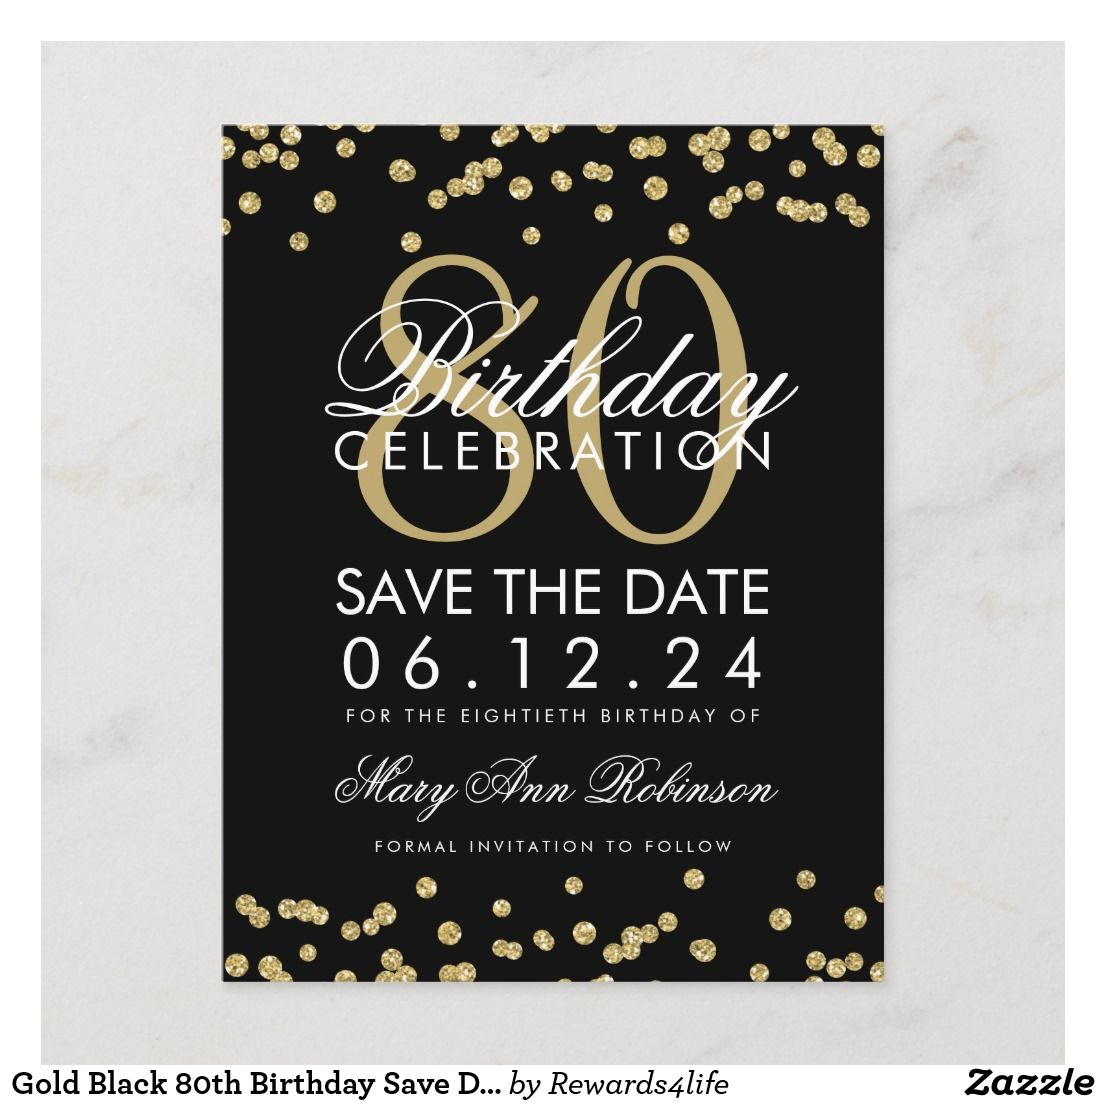 Gold Black 80th Birthday Save Date Confetti Save The Date Zazzle Com 80th Birthday Invitations Birthday Invitations 80th Birthday Party Save the date birthday template